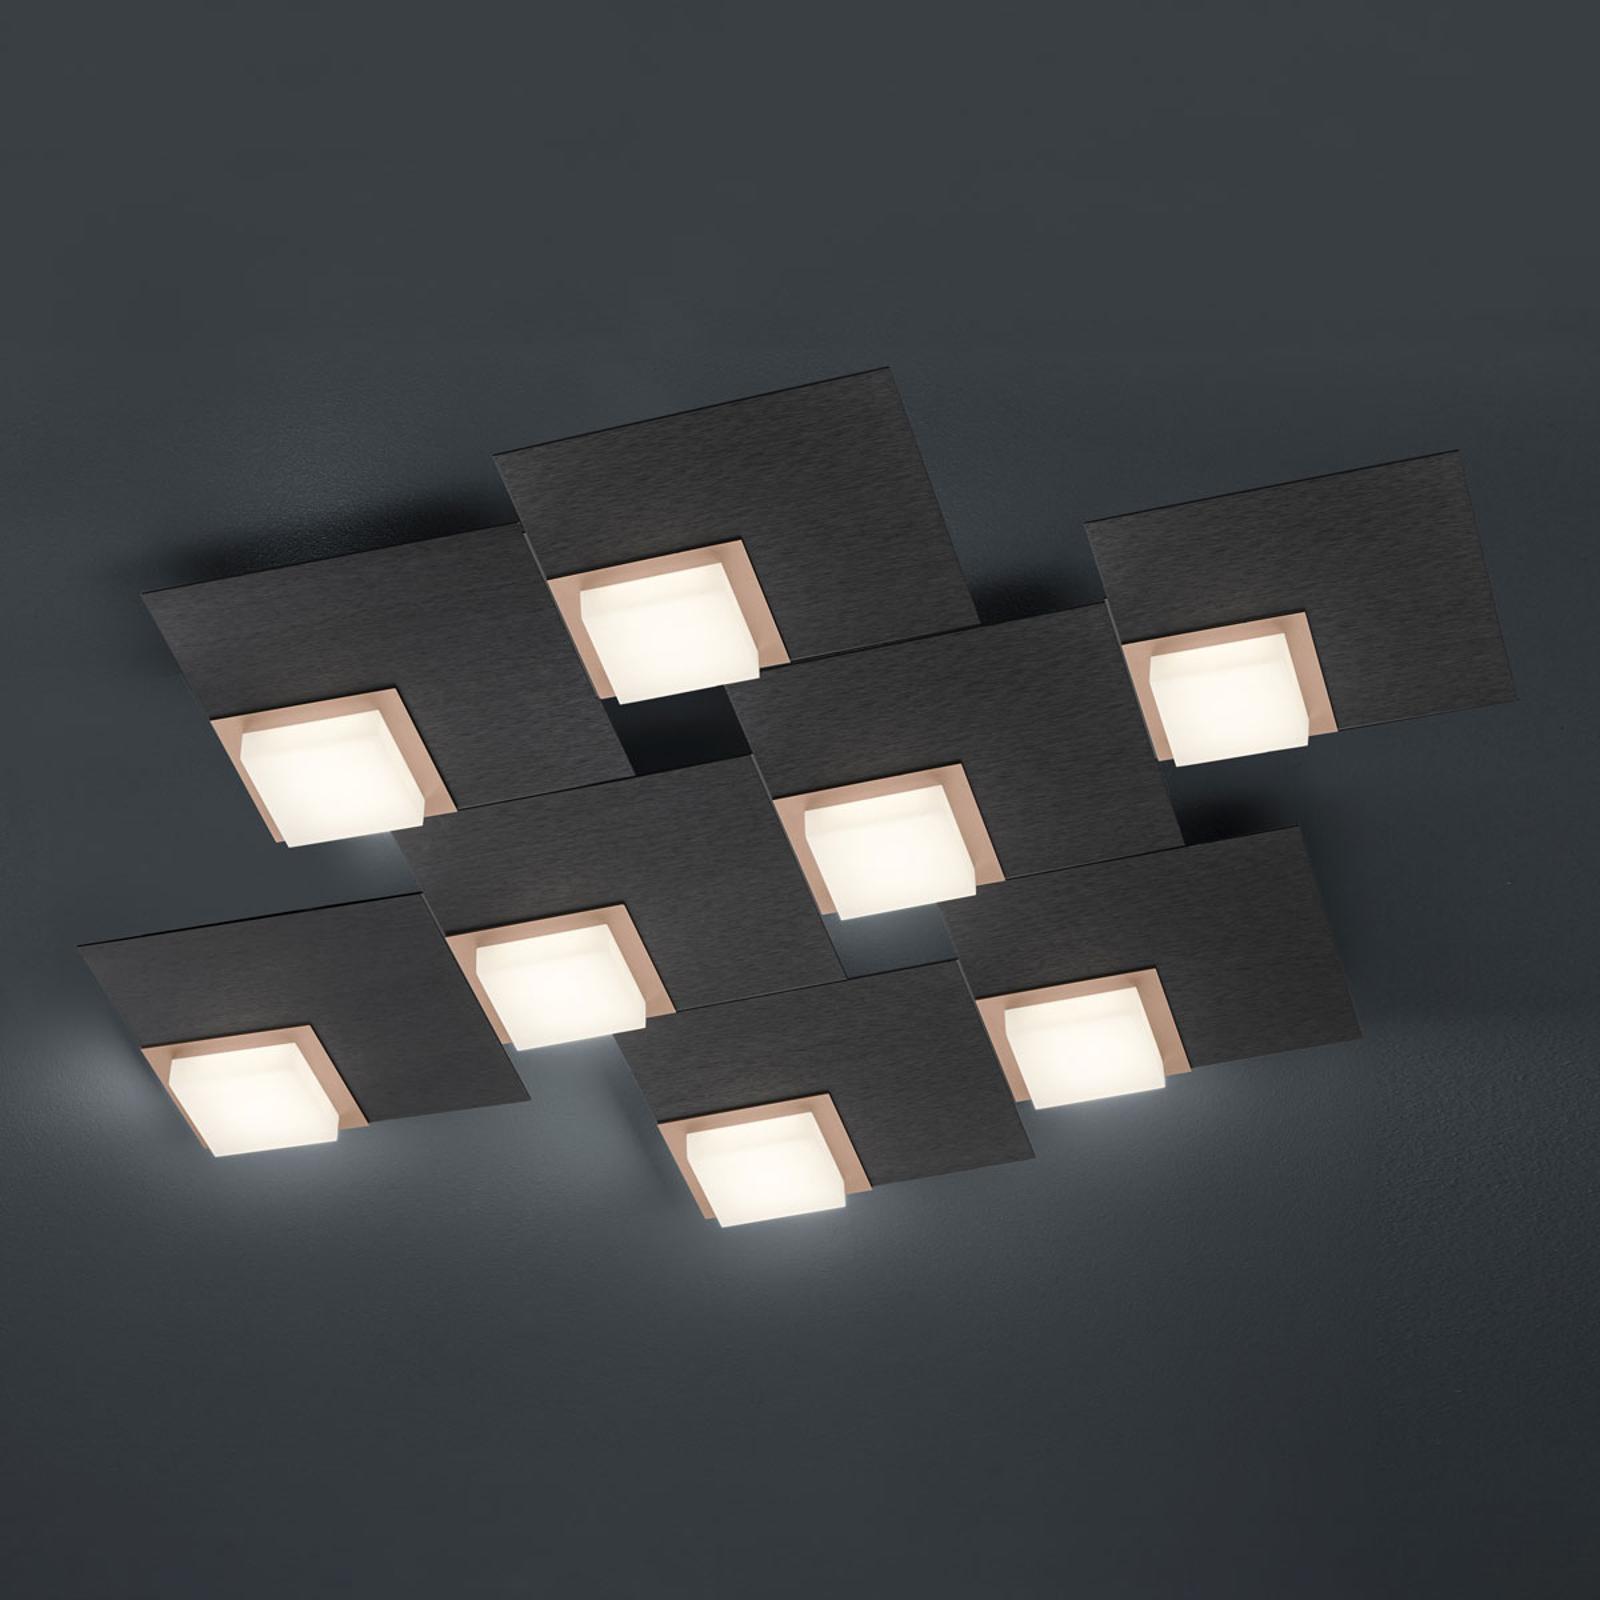 BANKAMP Quadro LED-Deckenleuchte 64W, anthrazit